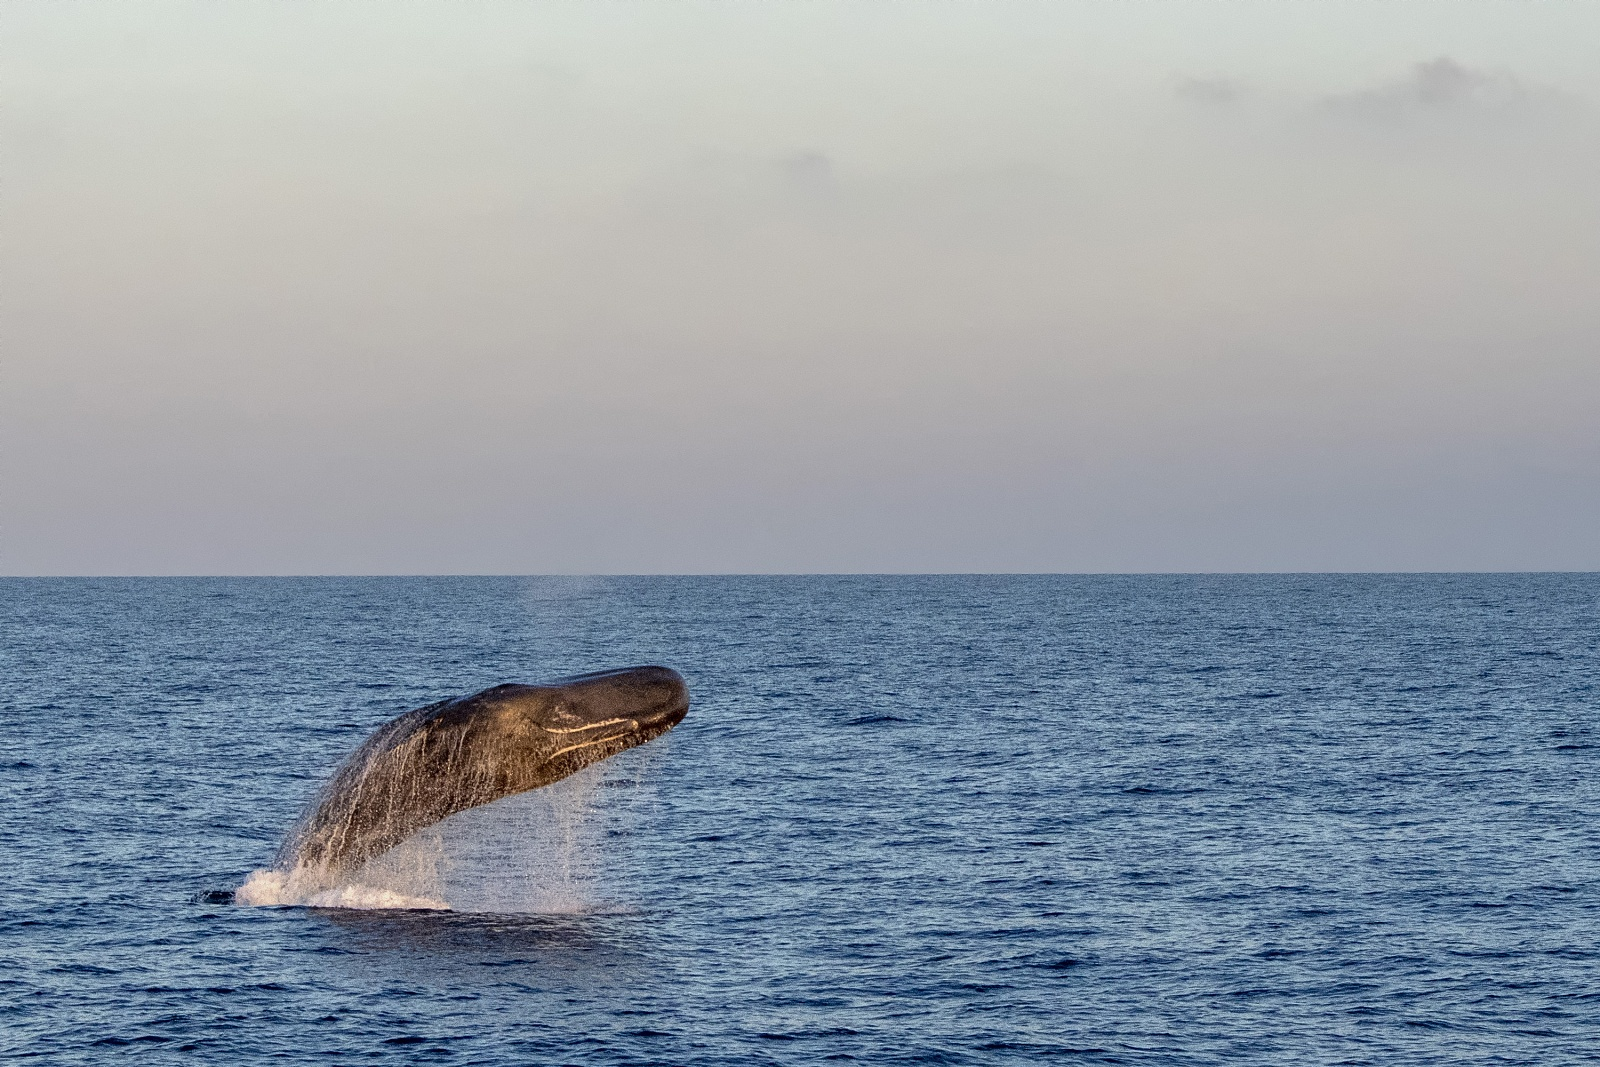 Breaching sperm whale - August 2020, Genoa, Italy